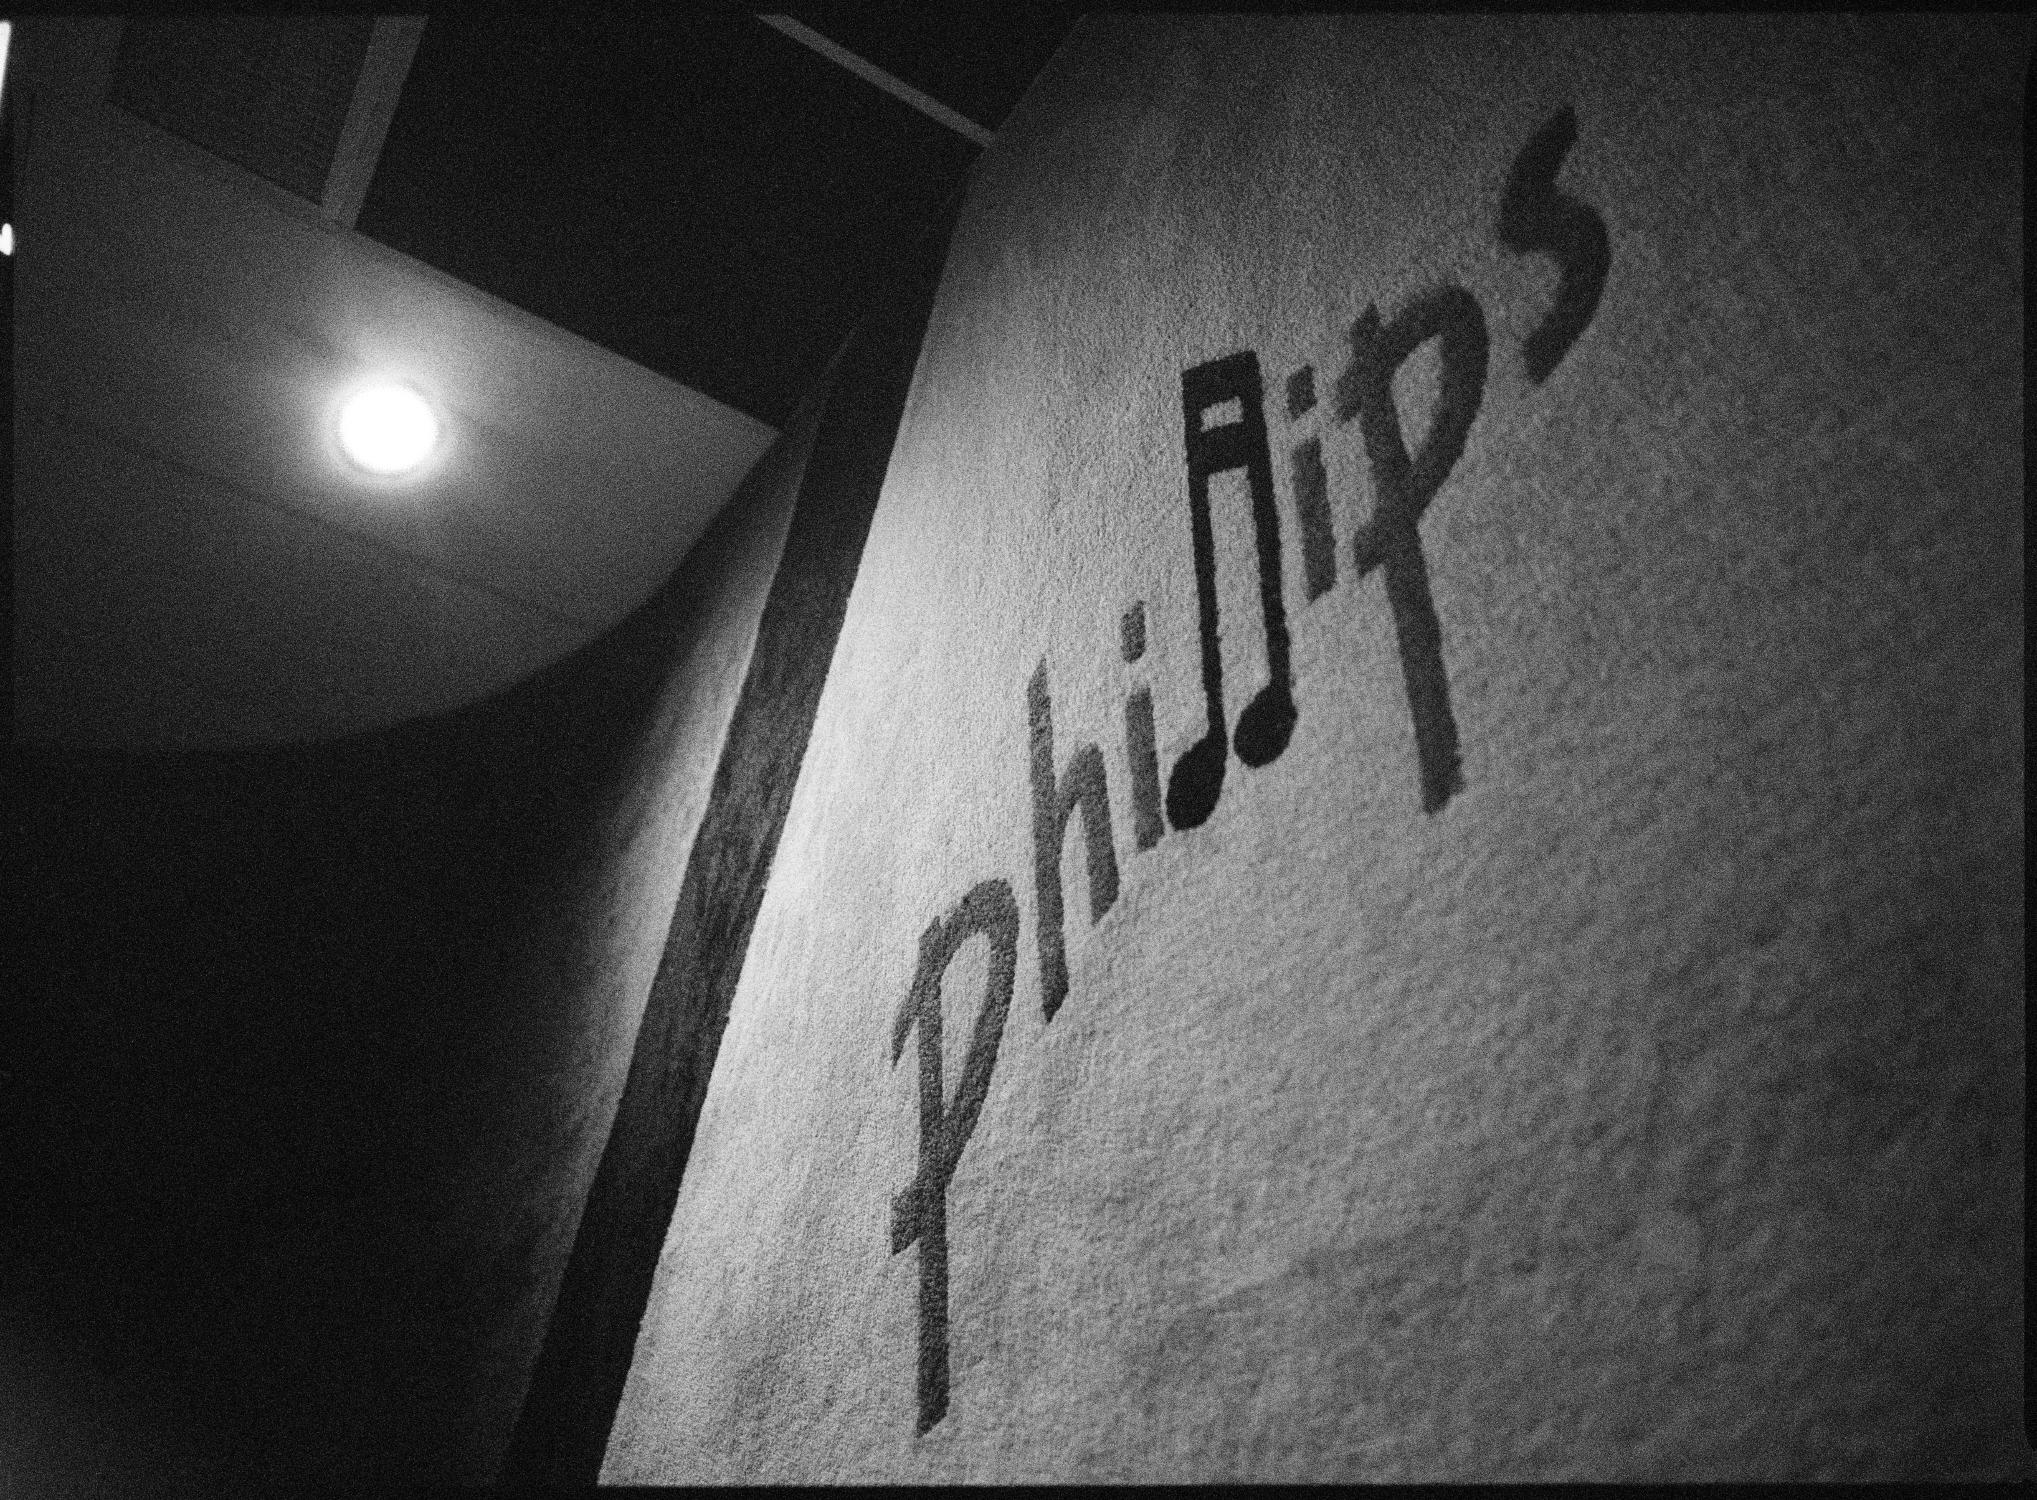 Control Room at Sam Phillips Recording in Memphis, TN